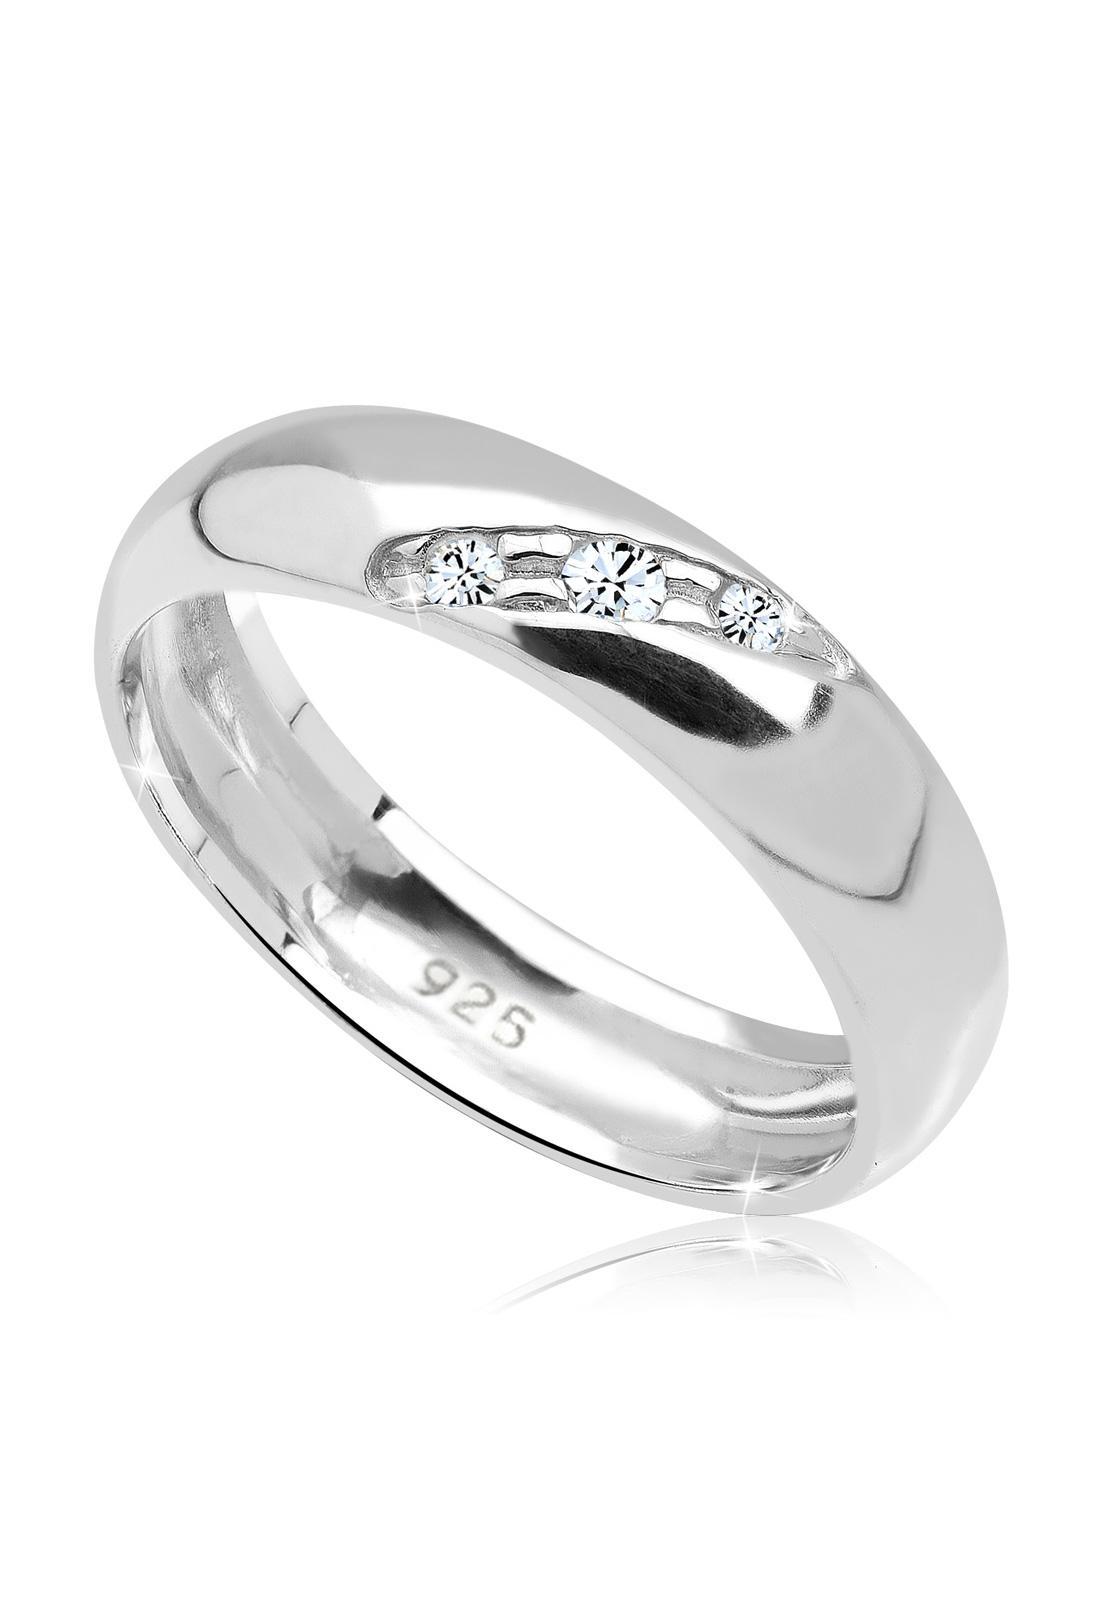 Beli Elli Germany 925 Silver Cincin Elegant Swarovski Crystals Putih Online Murah